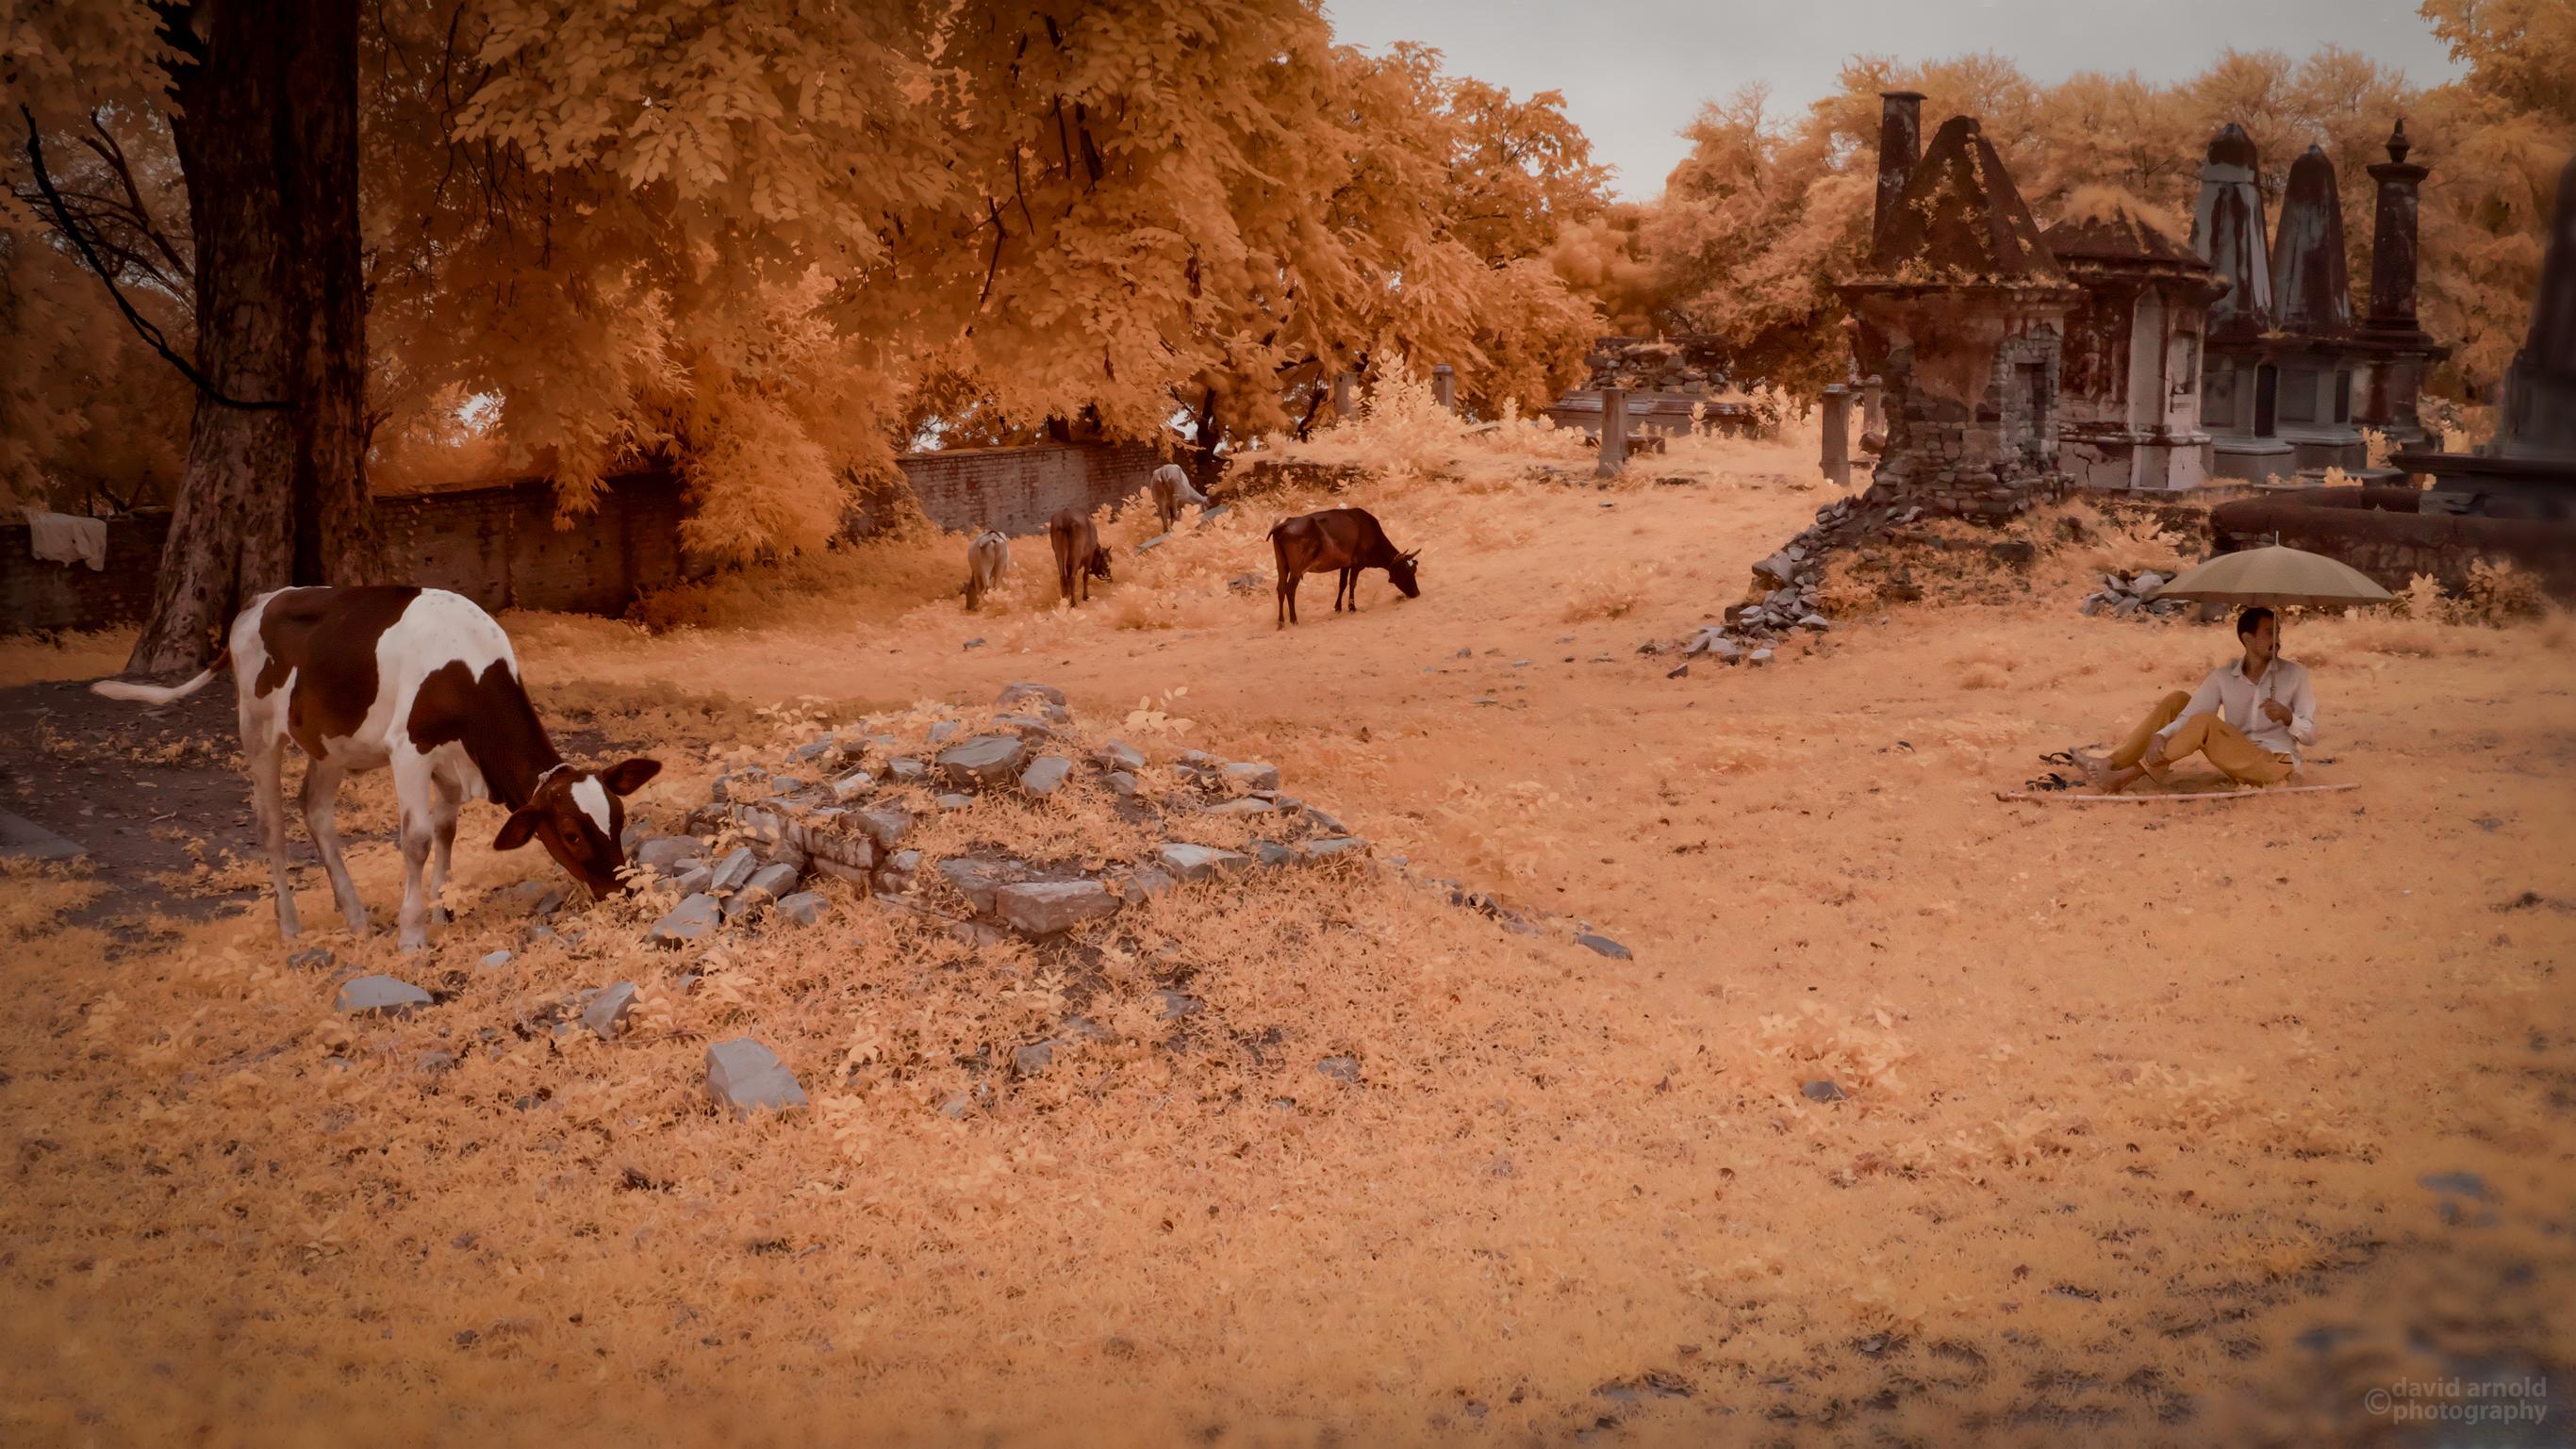 Cows Grazing, British Cemetery, Chunar, India